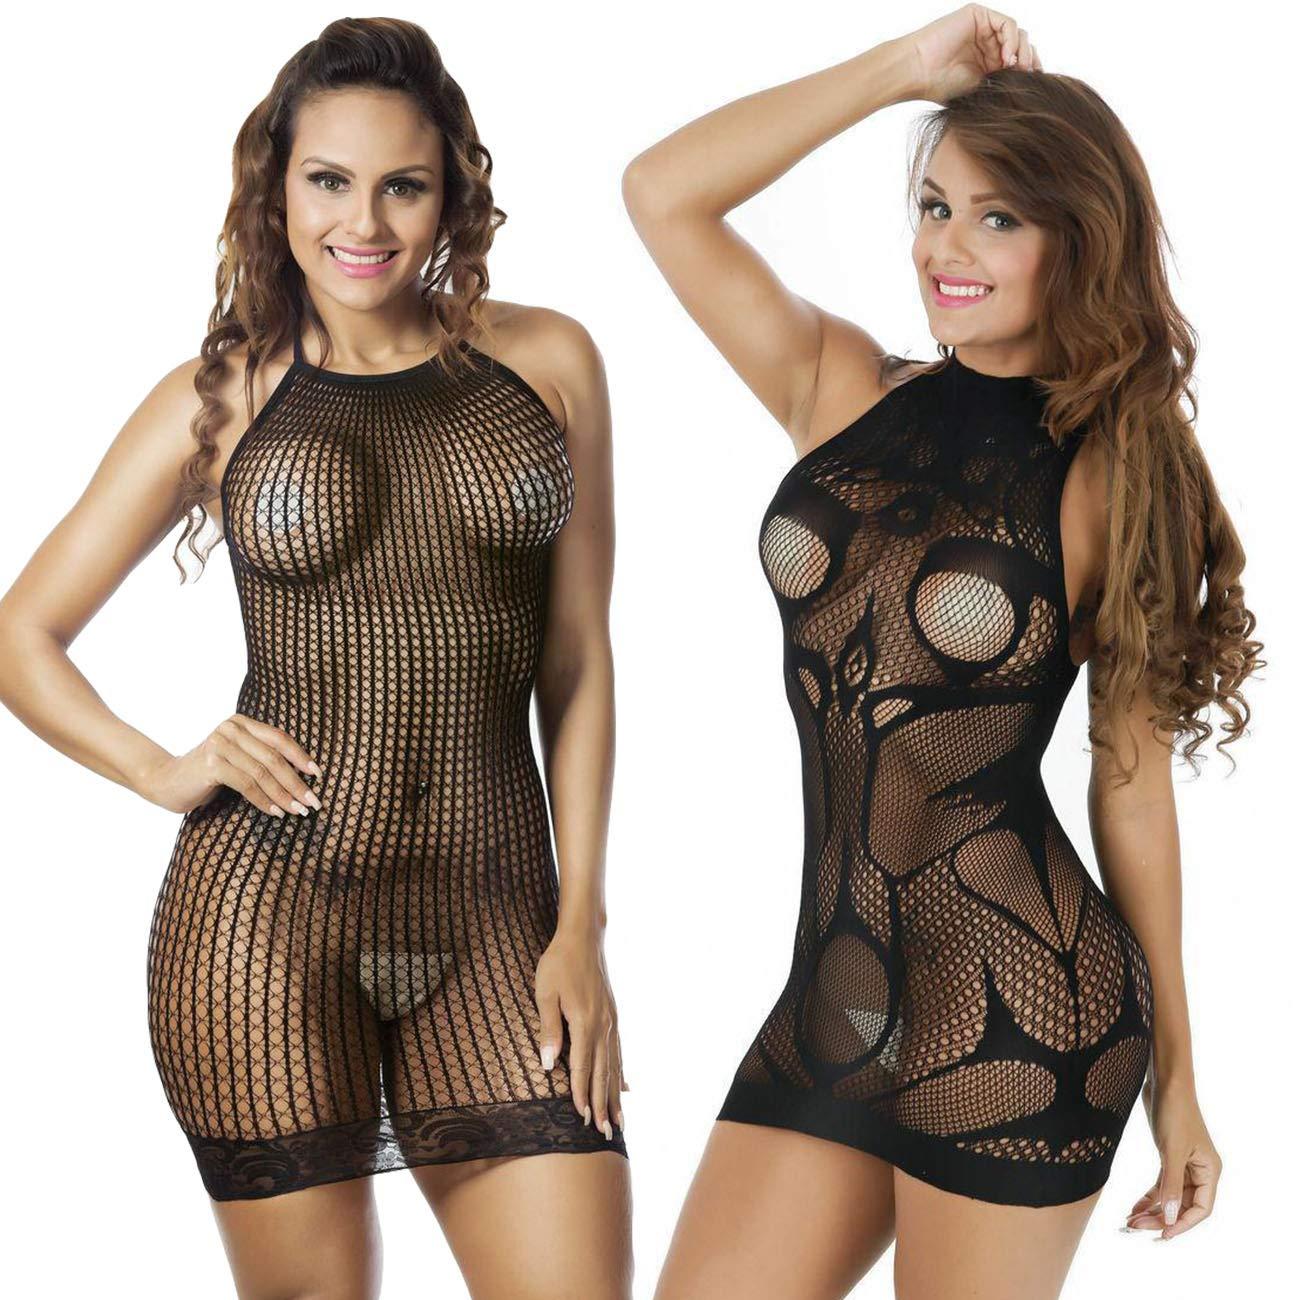 LOVELYBOBO 2 Pack Babydoll Lingerie Donne Chemise Costume Negligrees per Nuova Moda Design Pigiama Nero